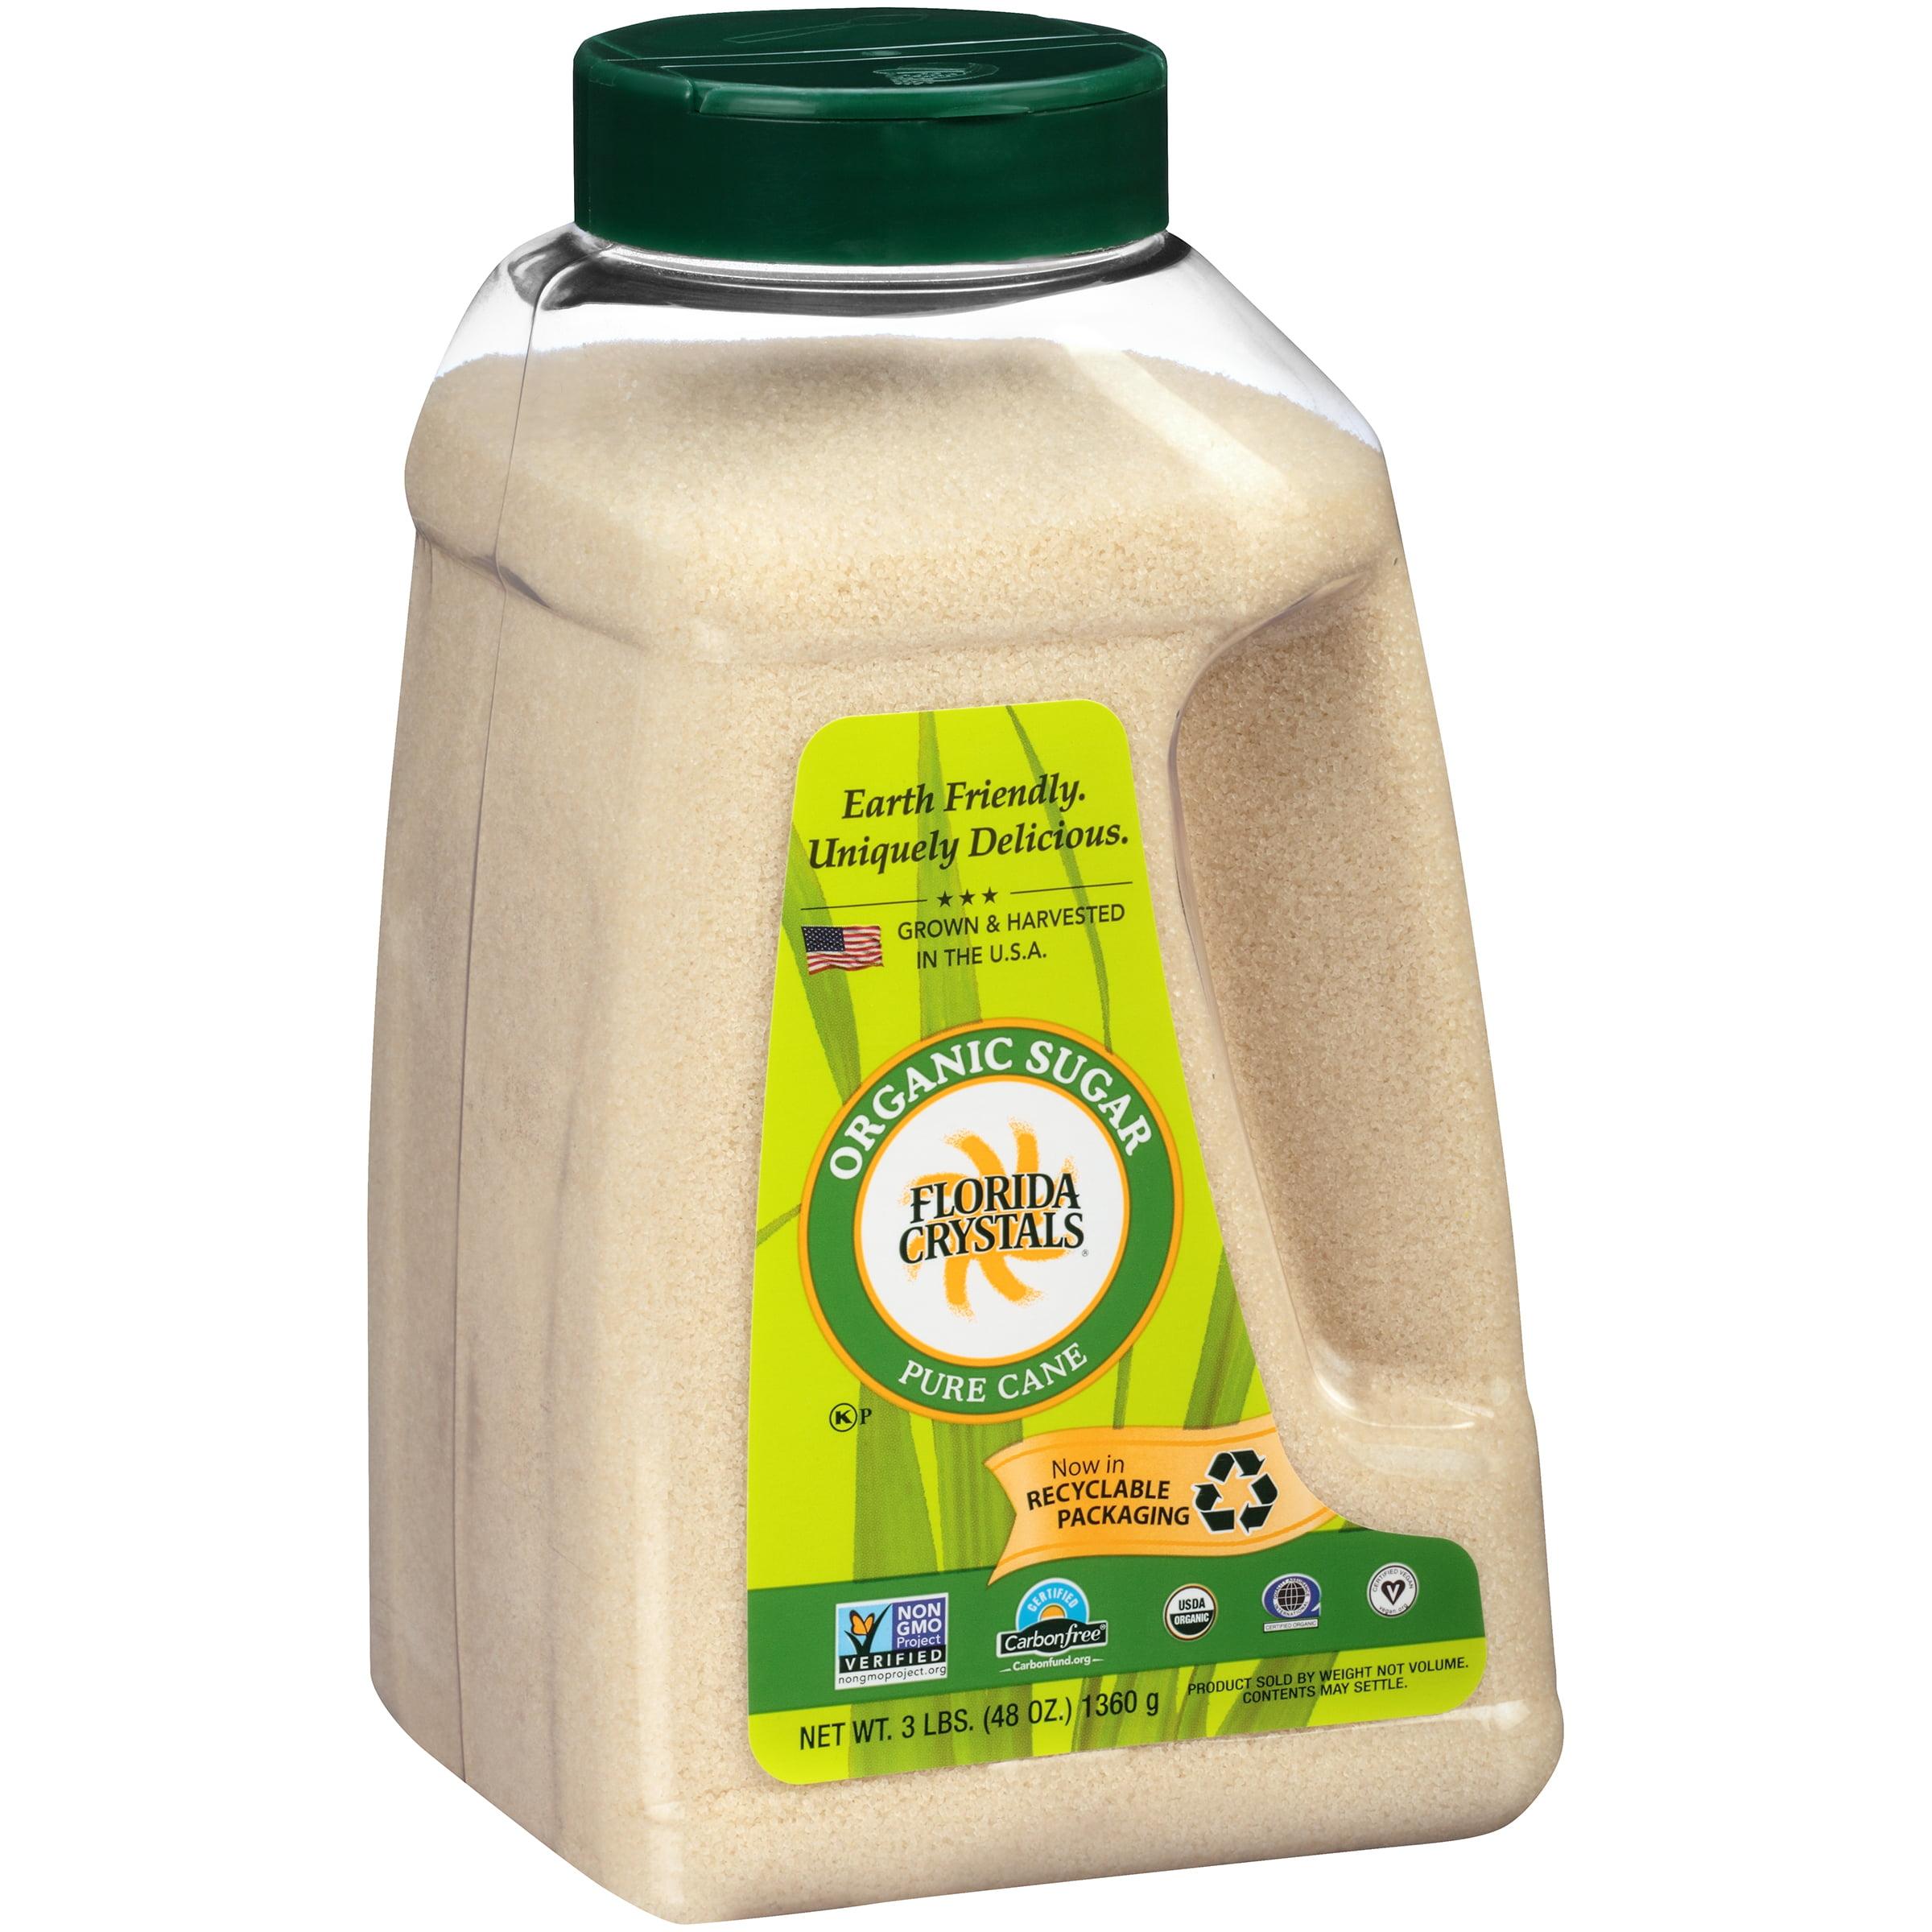 Florida Crystal's Organic Cane Sugar 48 Oz Shaker